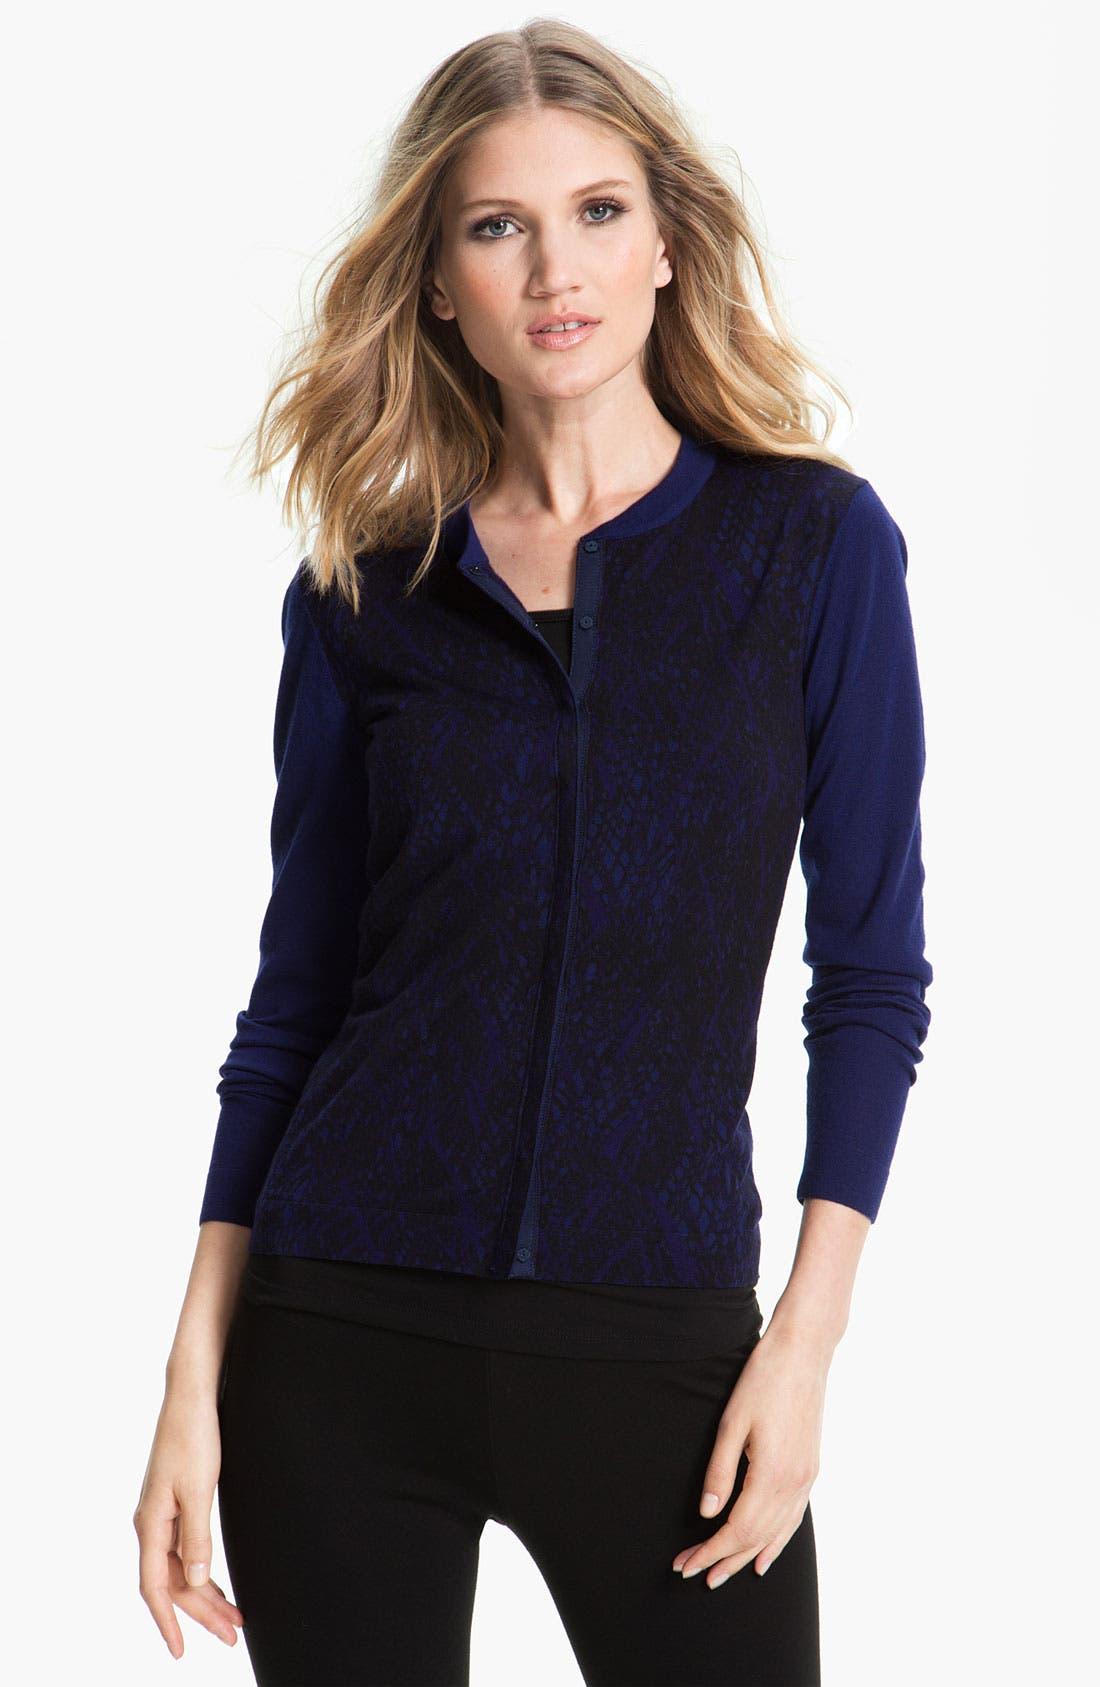 Alternate Image 1 Selected - Elie Tahari Exclusive for Nordstrom 'Yarden' Sweater